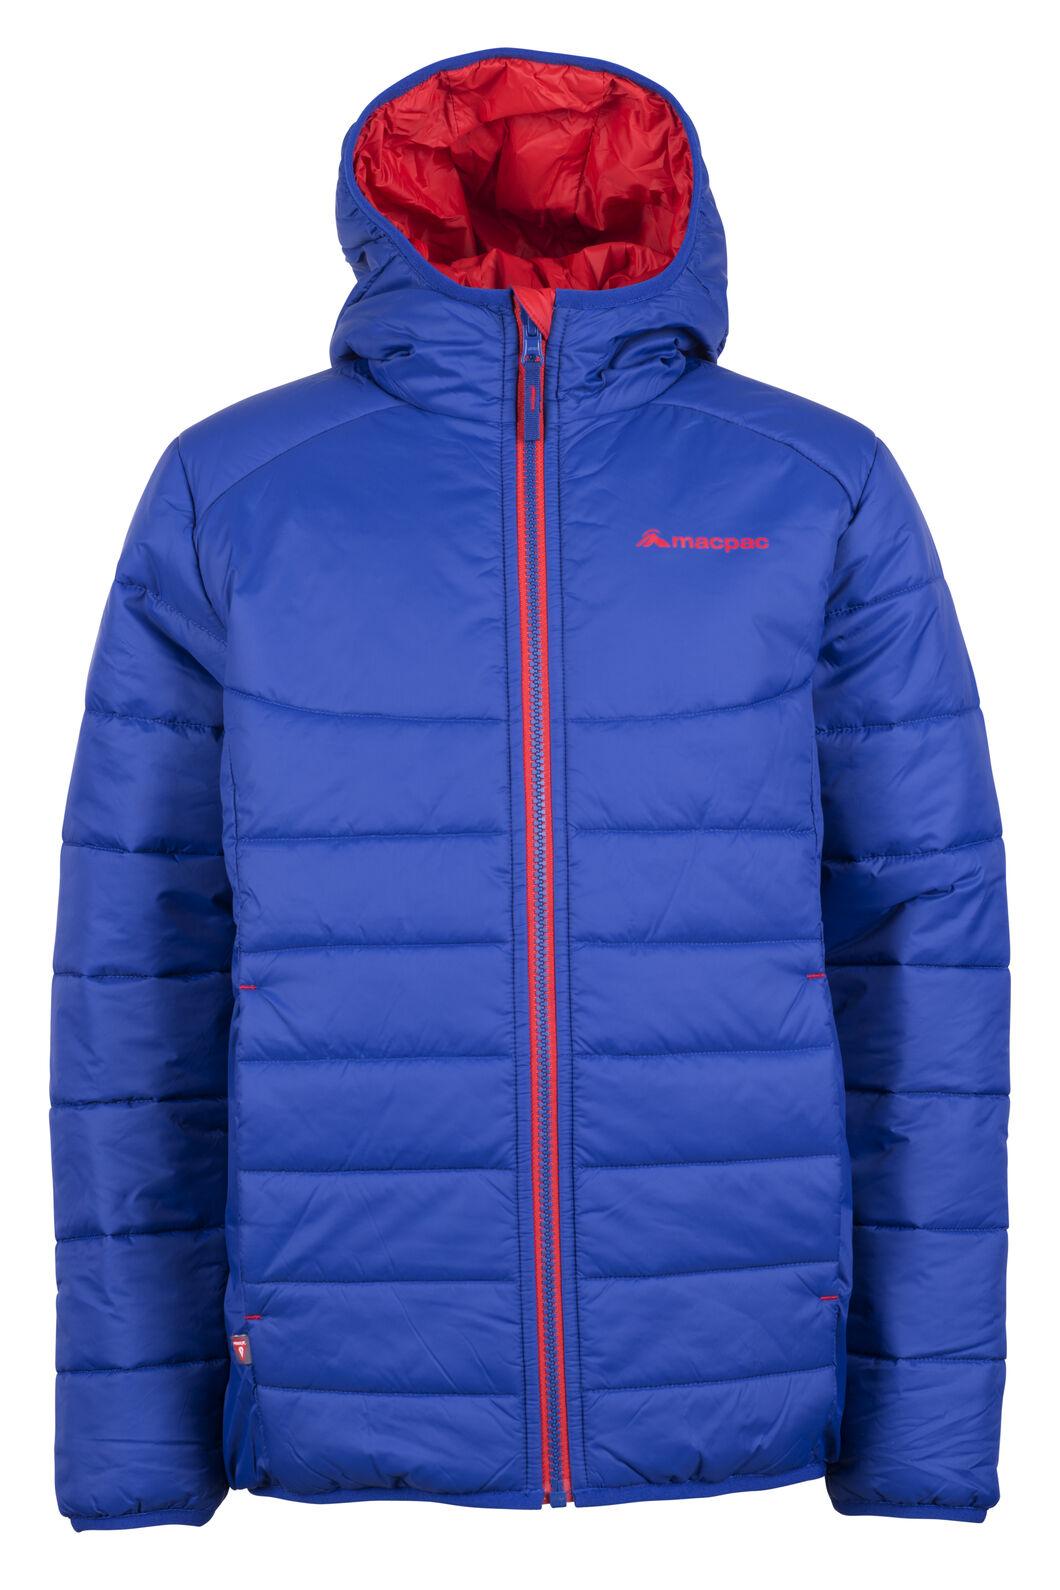 Macpac Pulsar Hooded Primaloft® SILVER Jacket - Kids', Sodalite Blue, hi-res